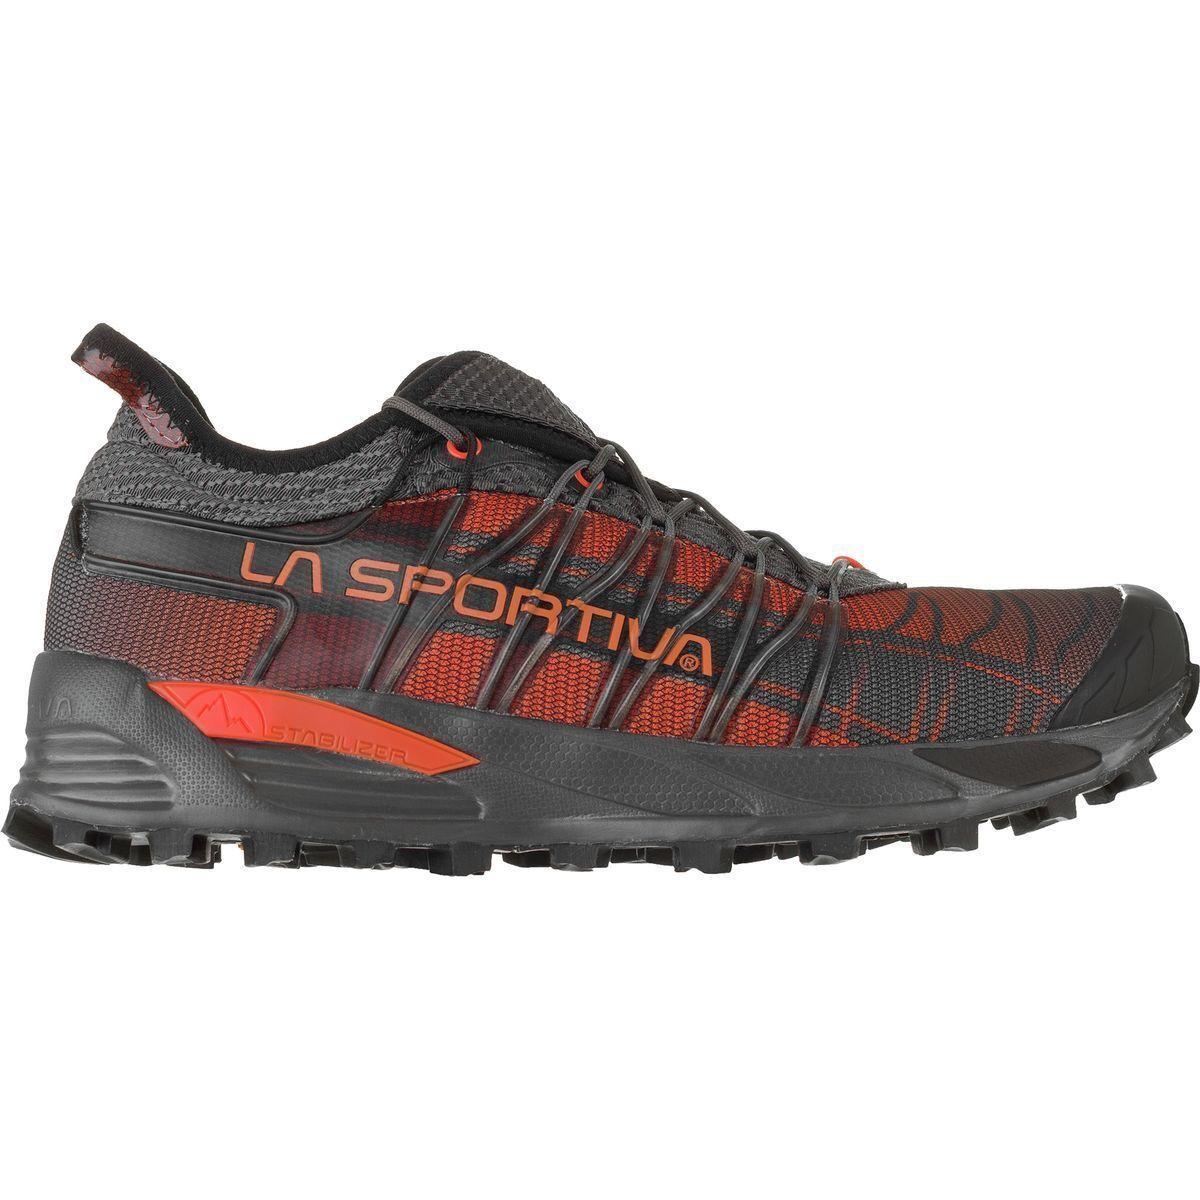 La Sportiva Mutant Running shoes - Men's